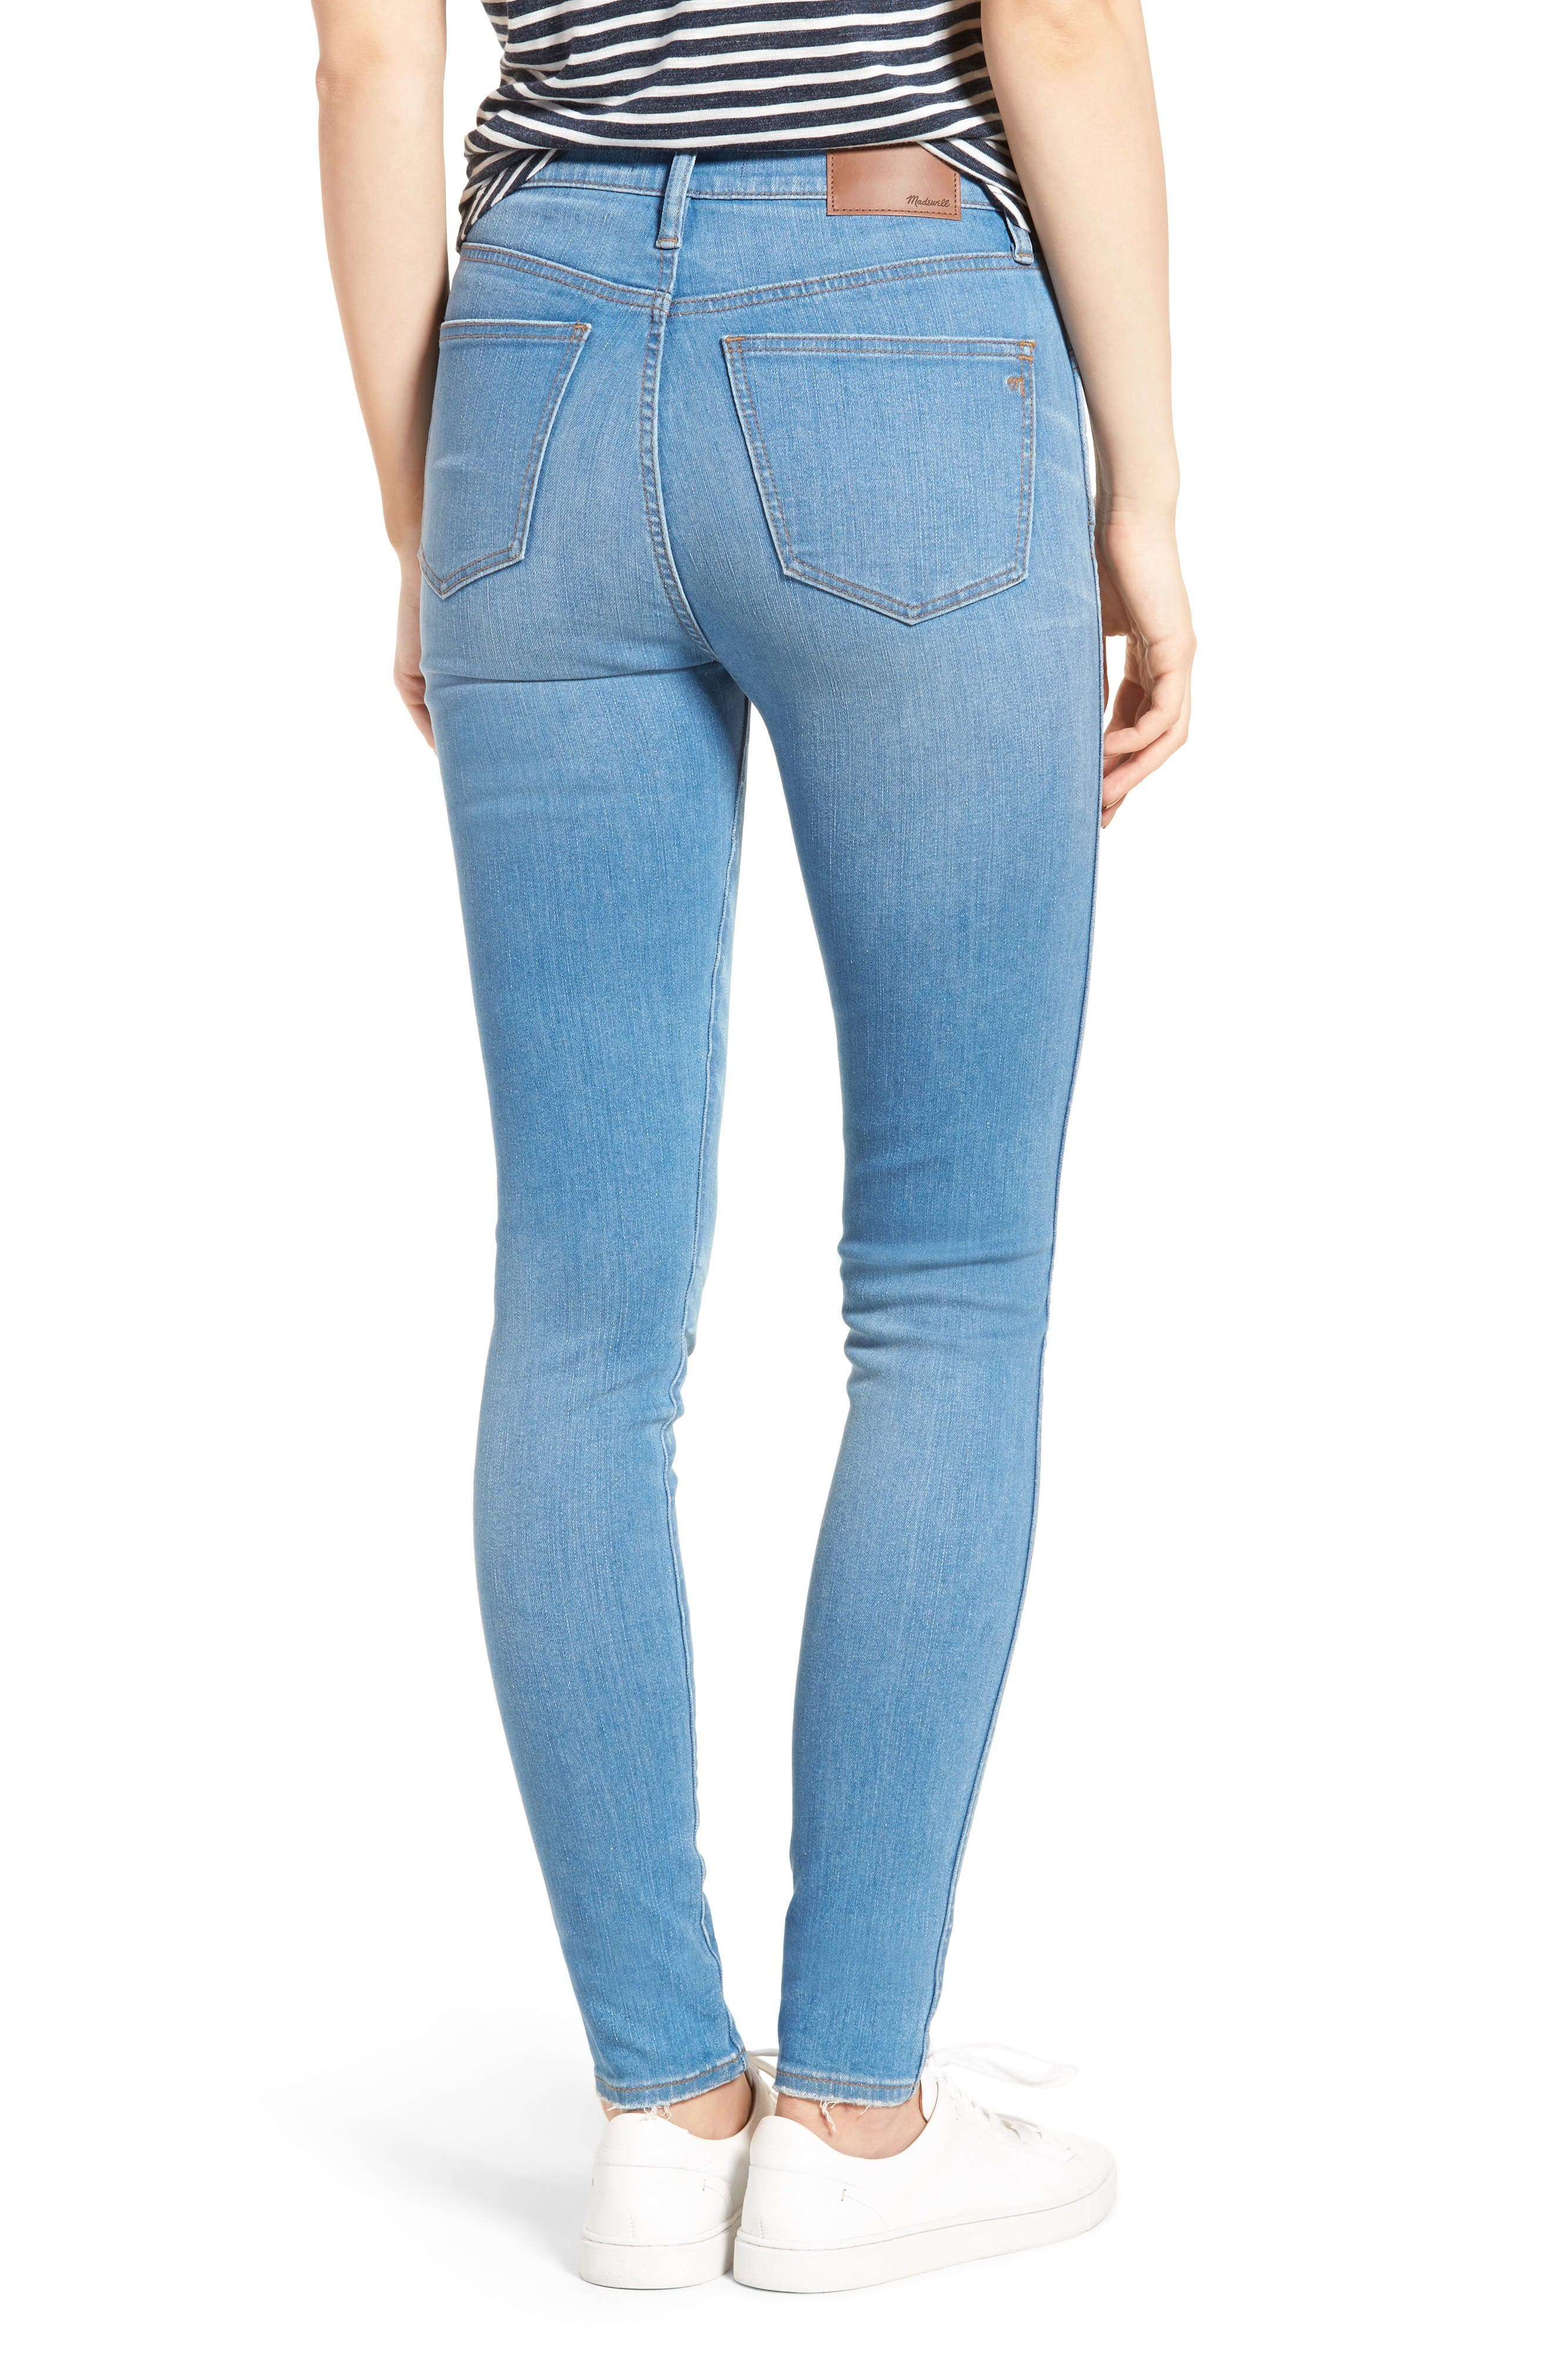 Alternate Image 2  - Madewell High Rise Skinny Jeans (Hank Wash)